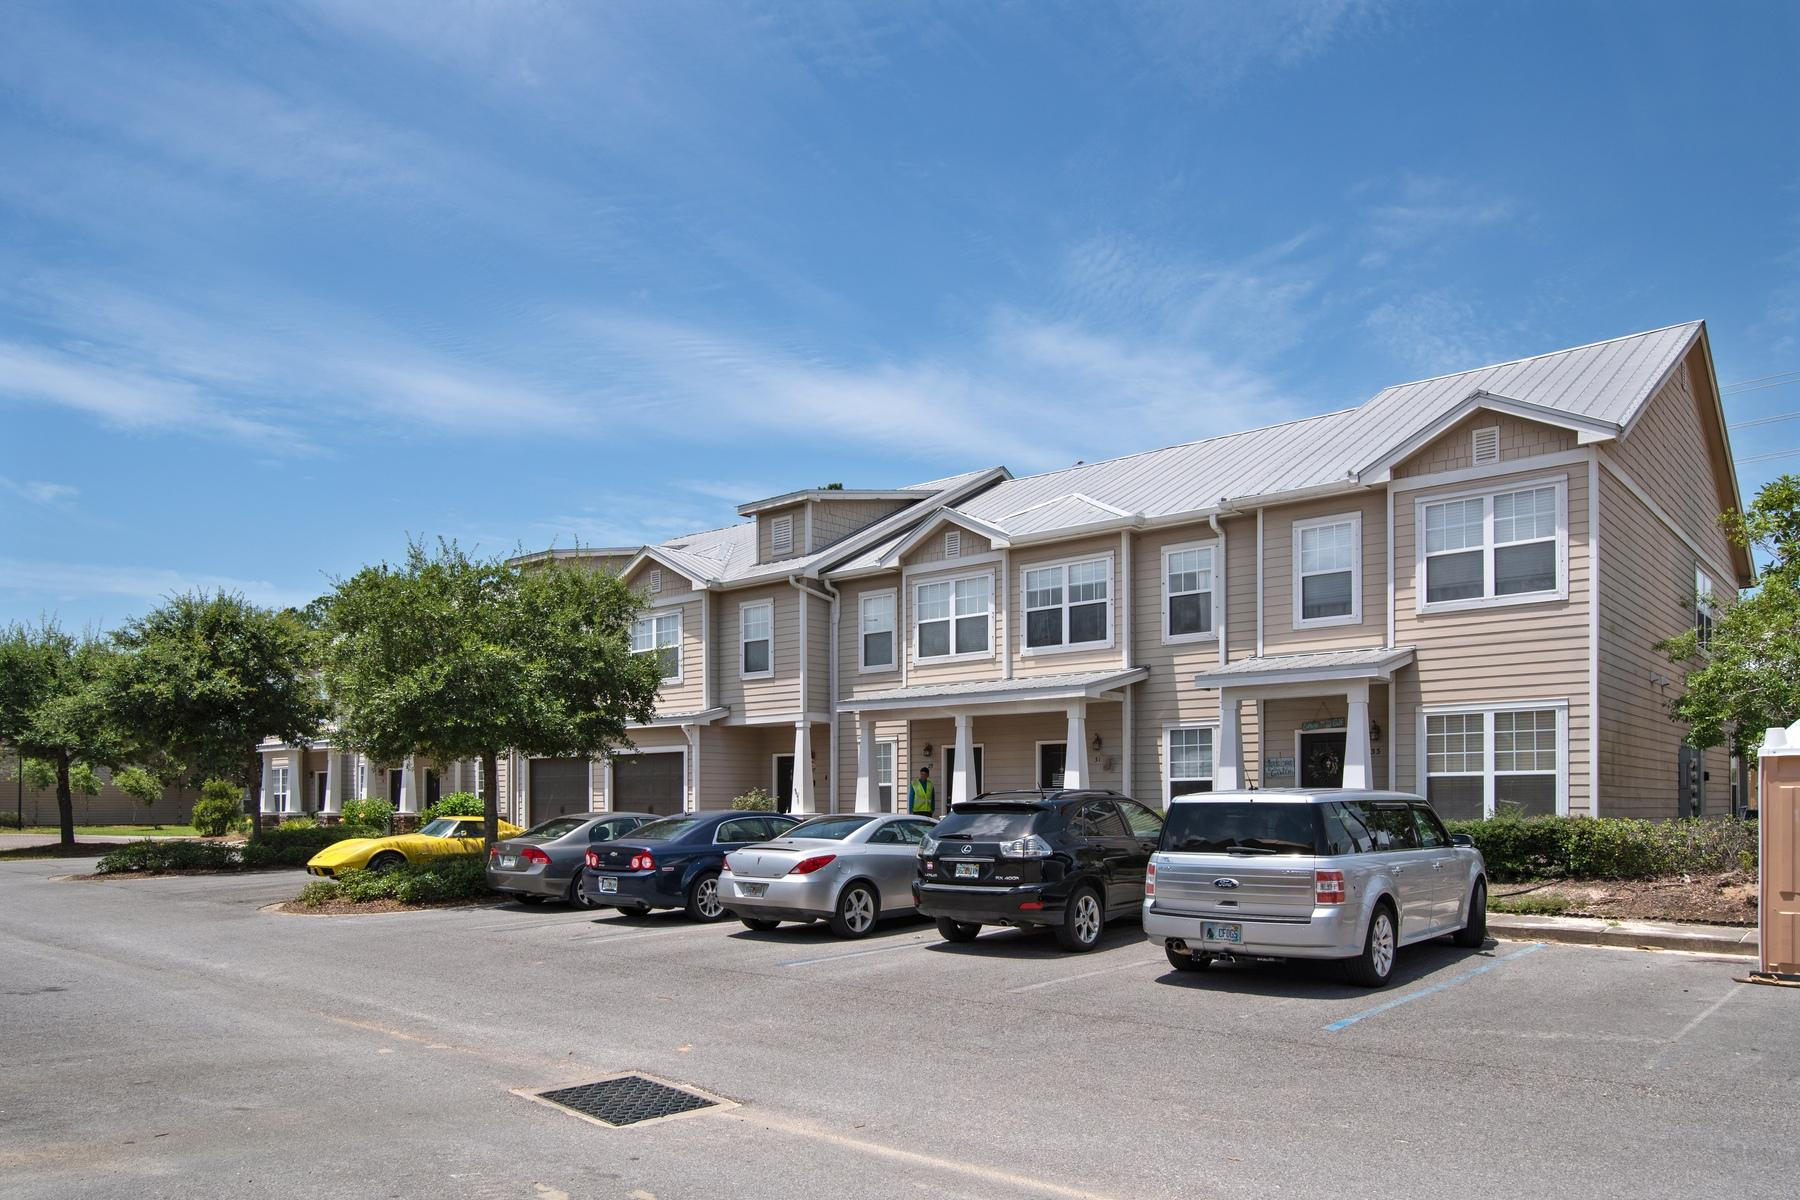 31 N Sand Palm Road Unit 59, Freeport, FL 32439